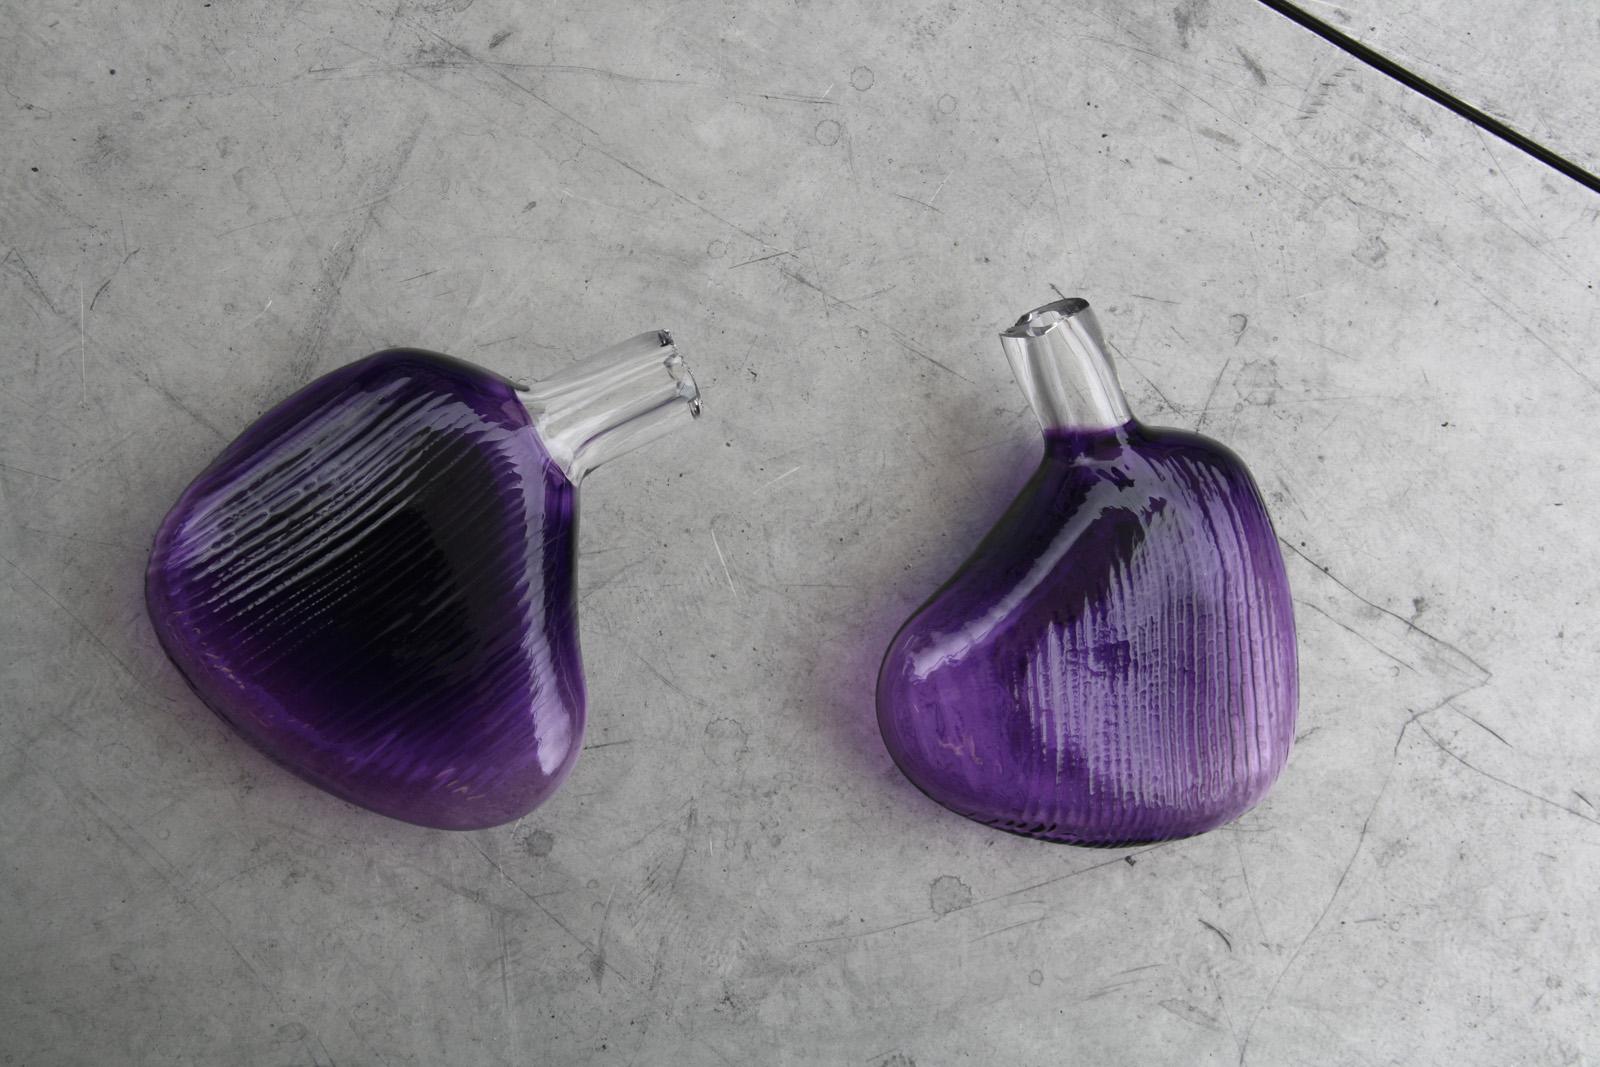 Design prototype by Sylvain Dubuisson for GlassLab Paris, 2013.